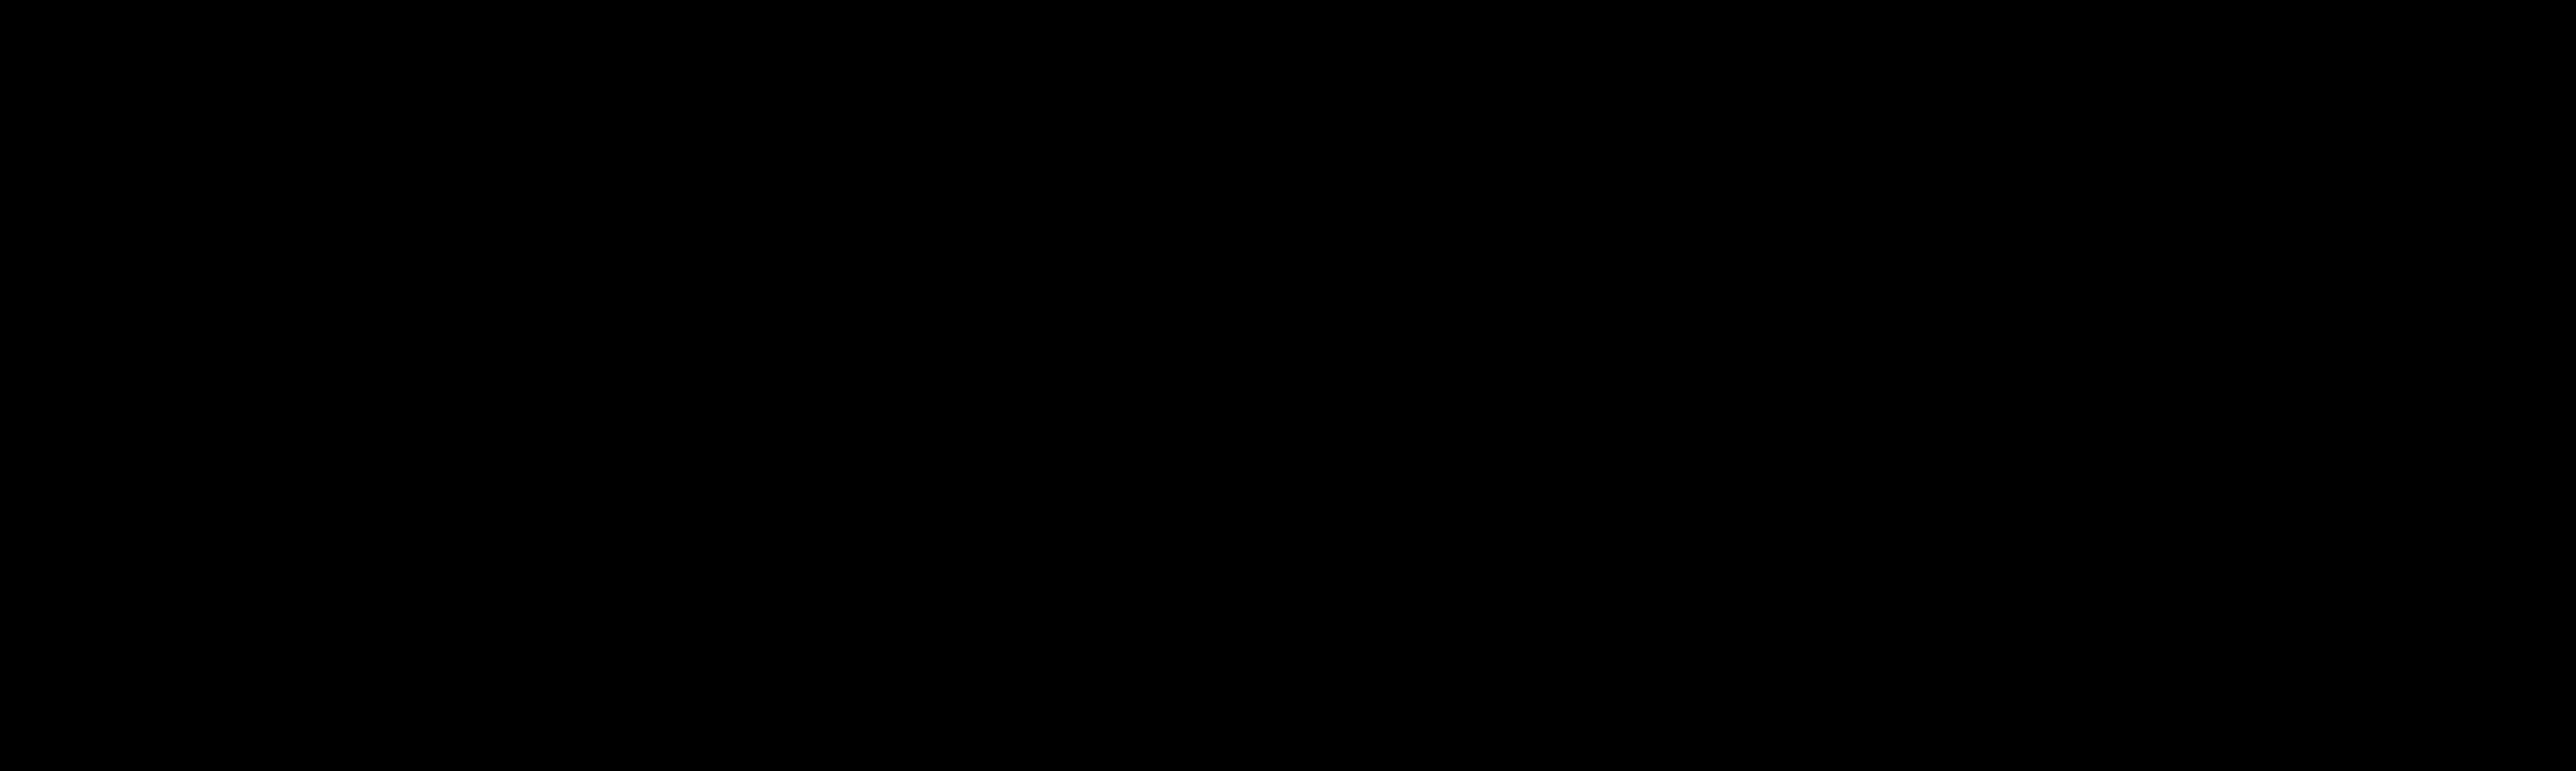 1936462-94-0